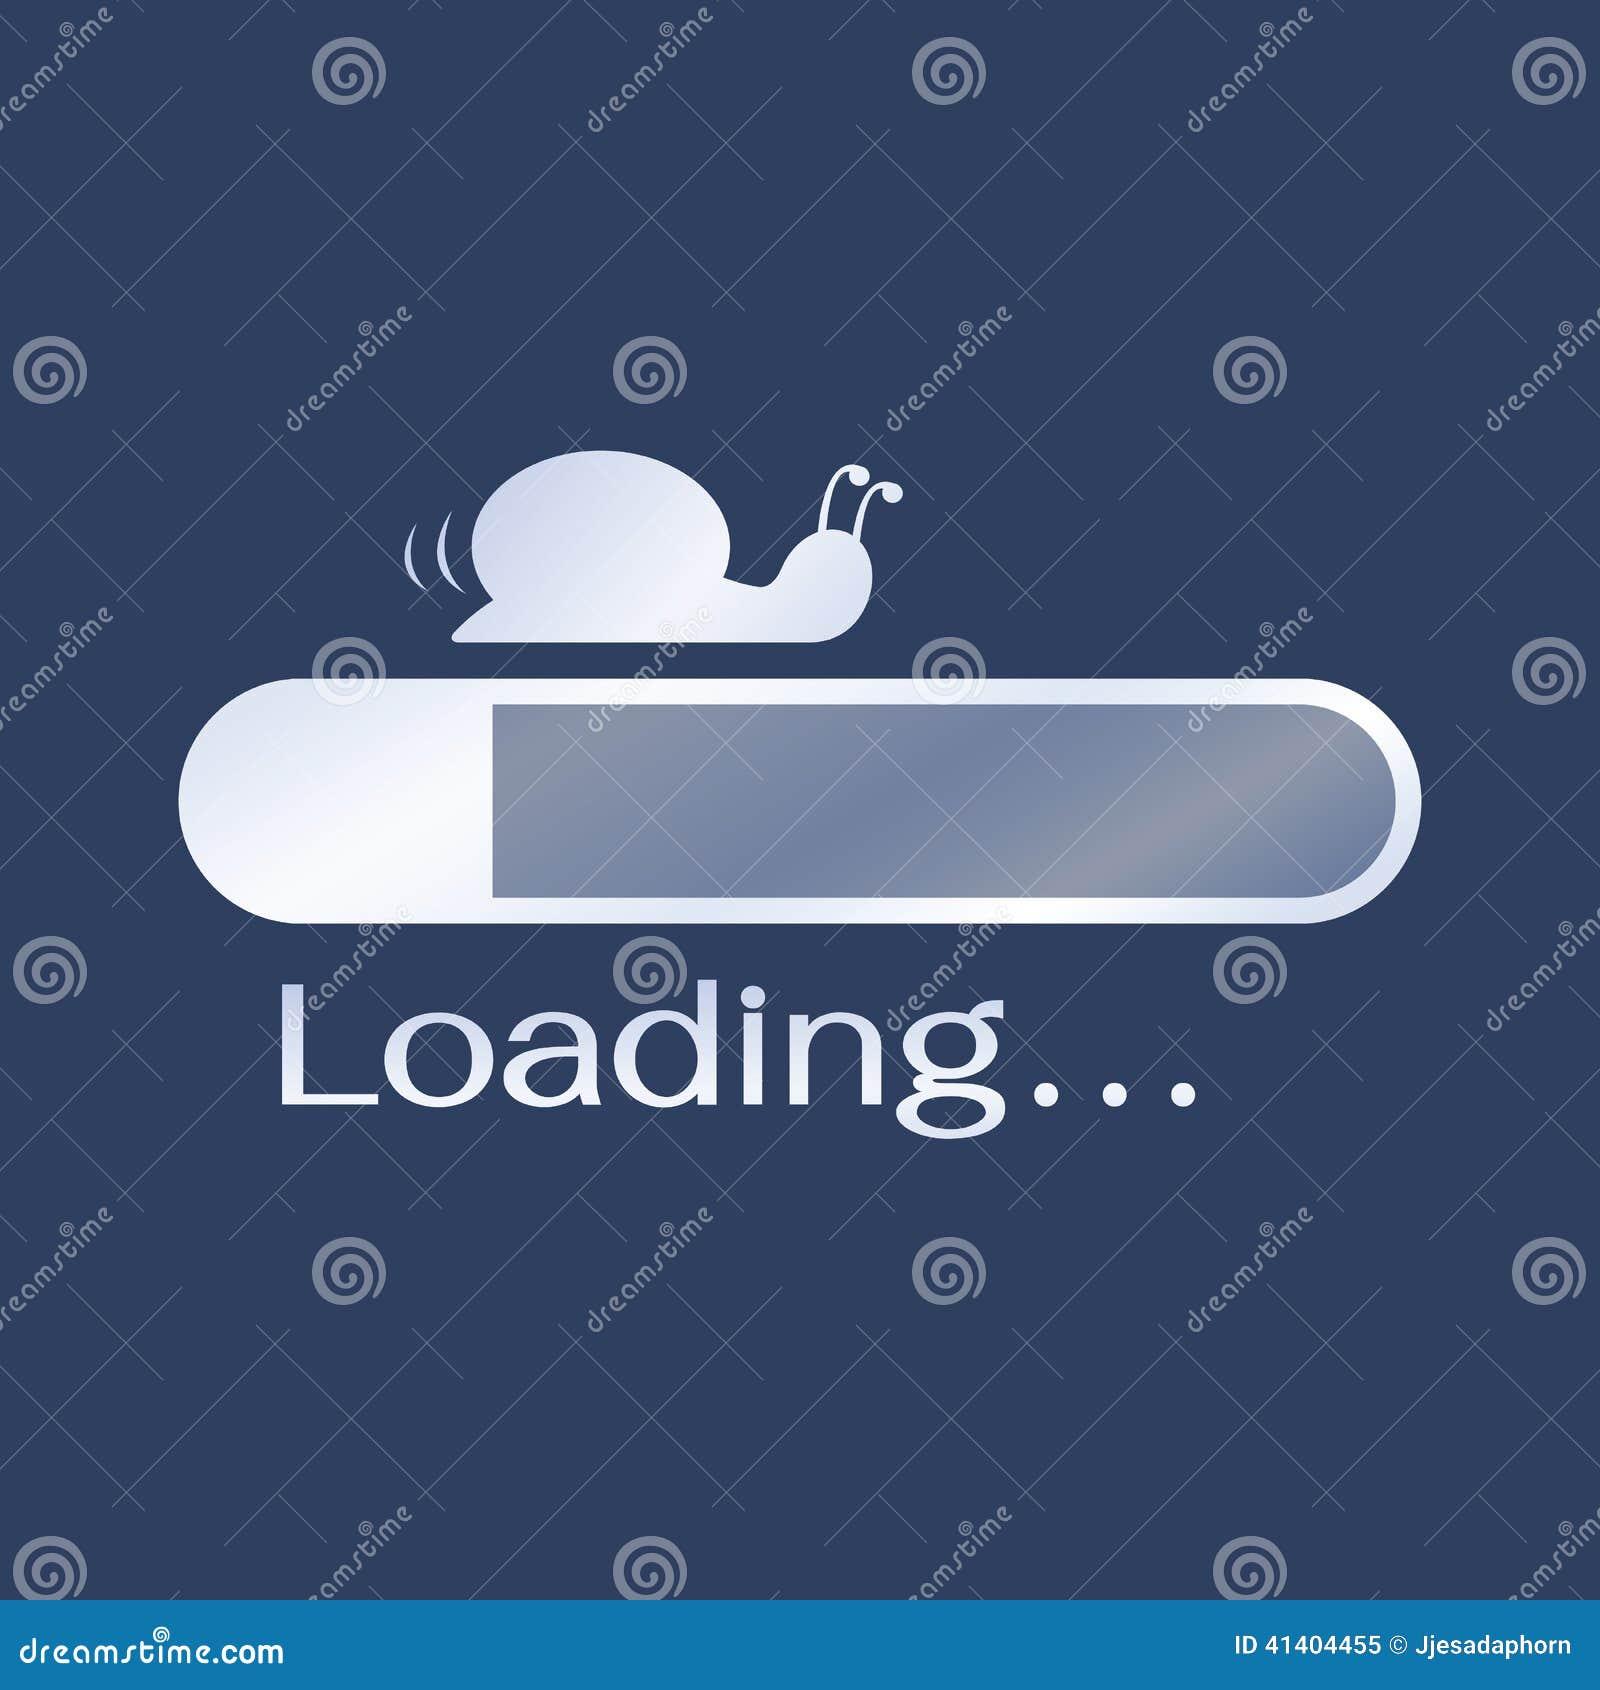 Daftar Harga Loading Complete Computer Loading Symbol Stock